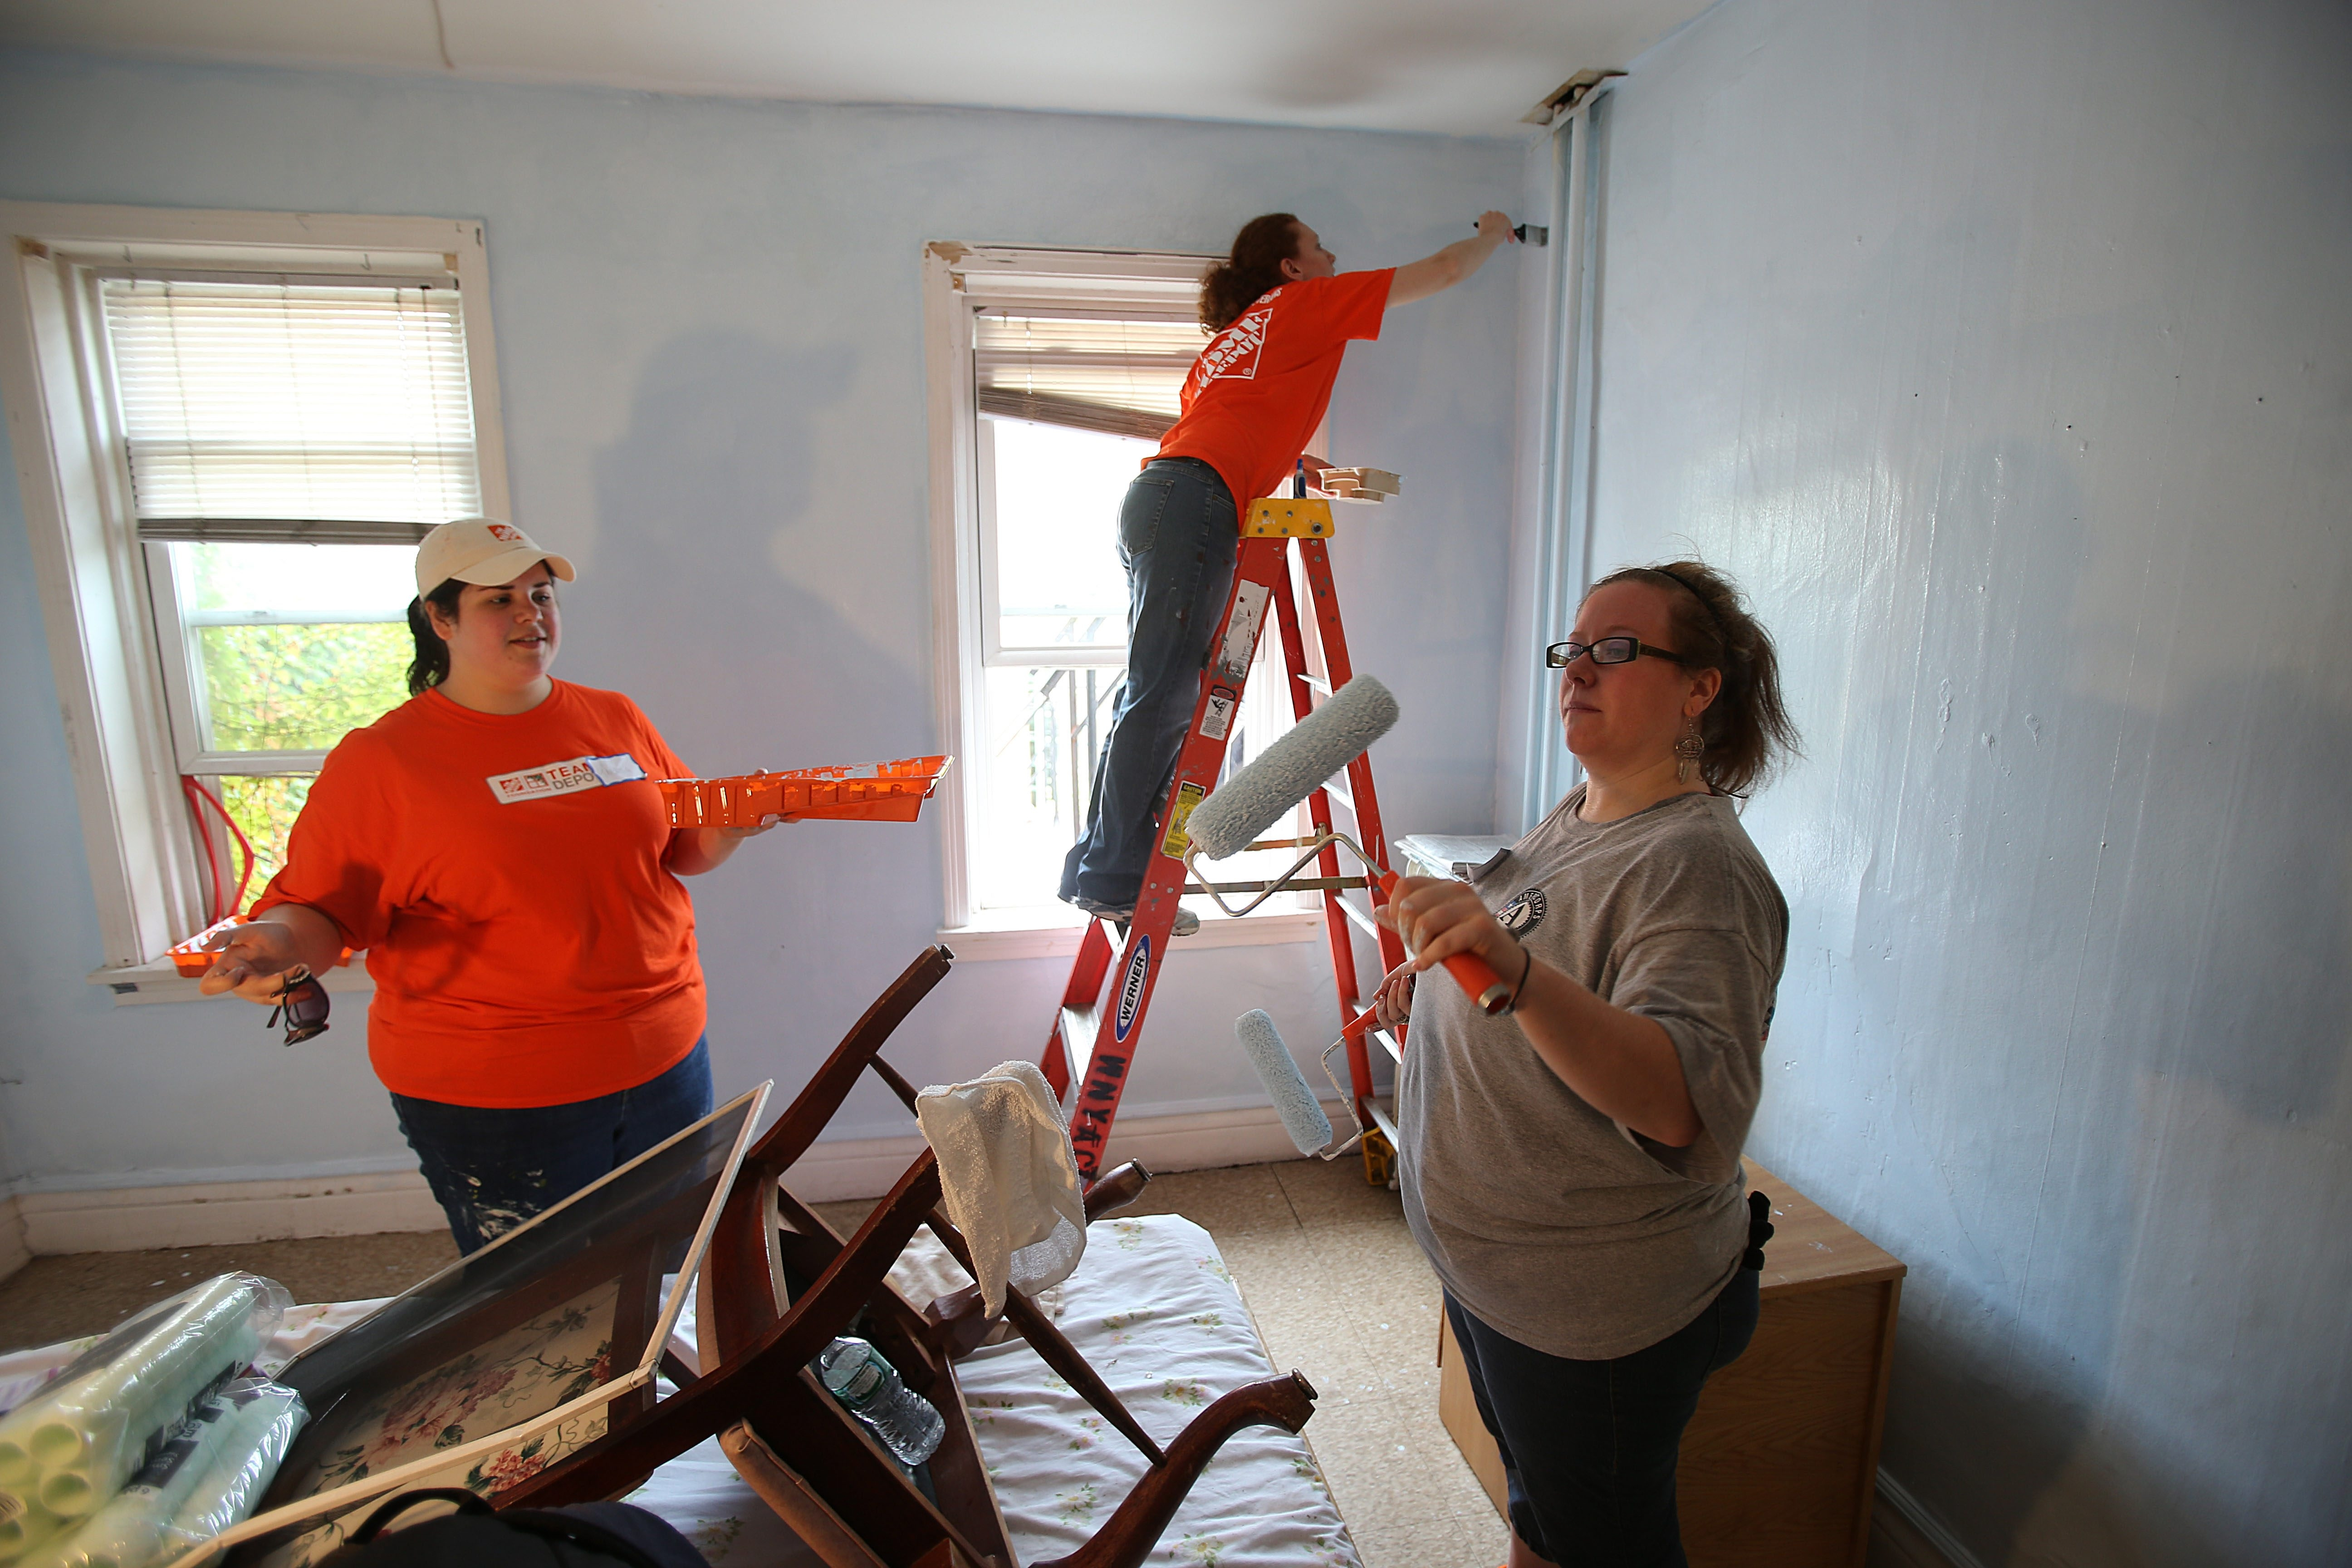 Volunteers, from left, Theresa Ziegler, Celeste Elliott and Megan Bingham, paint a room last September in Buffalo.